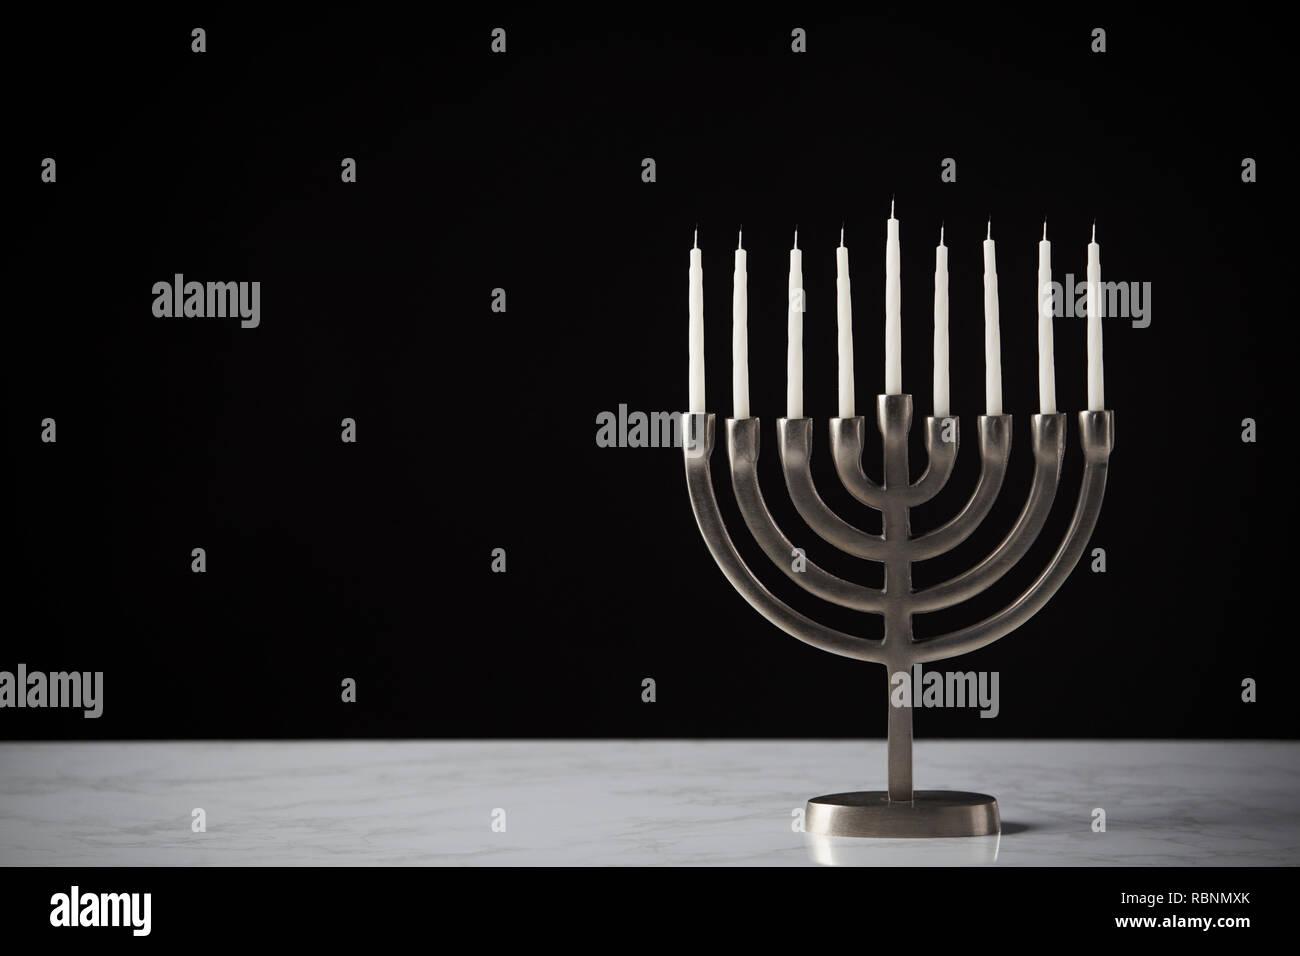 Metal Hanukkah Menorah With Unlit Candles On Marble Surface Against Black Studio Background - Stock Image